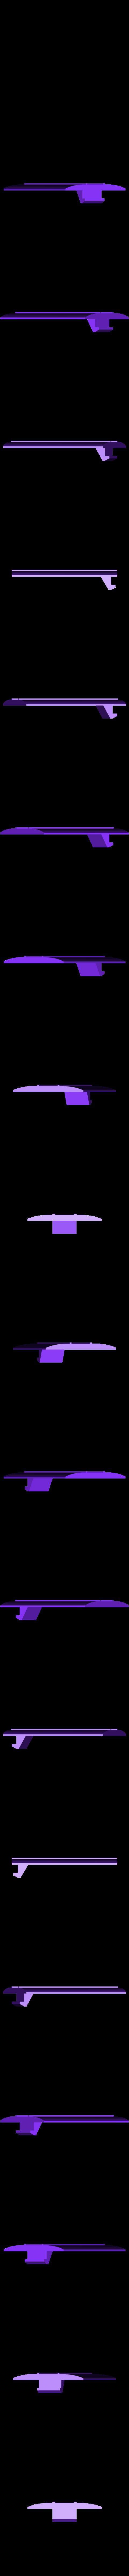 Rear_hatch.STL Download free STL file K-141 Kursk • 3D print template, Rusichar